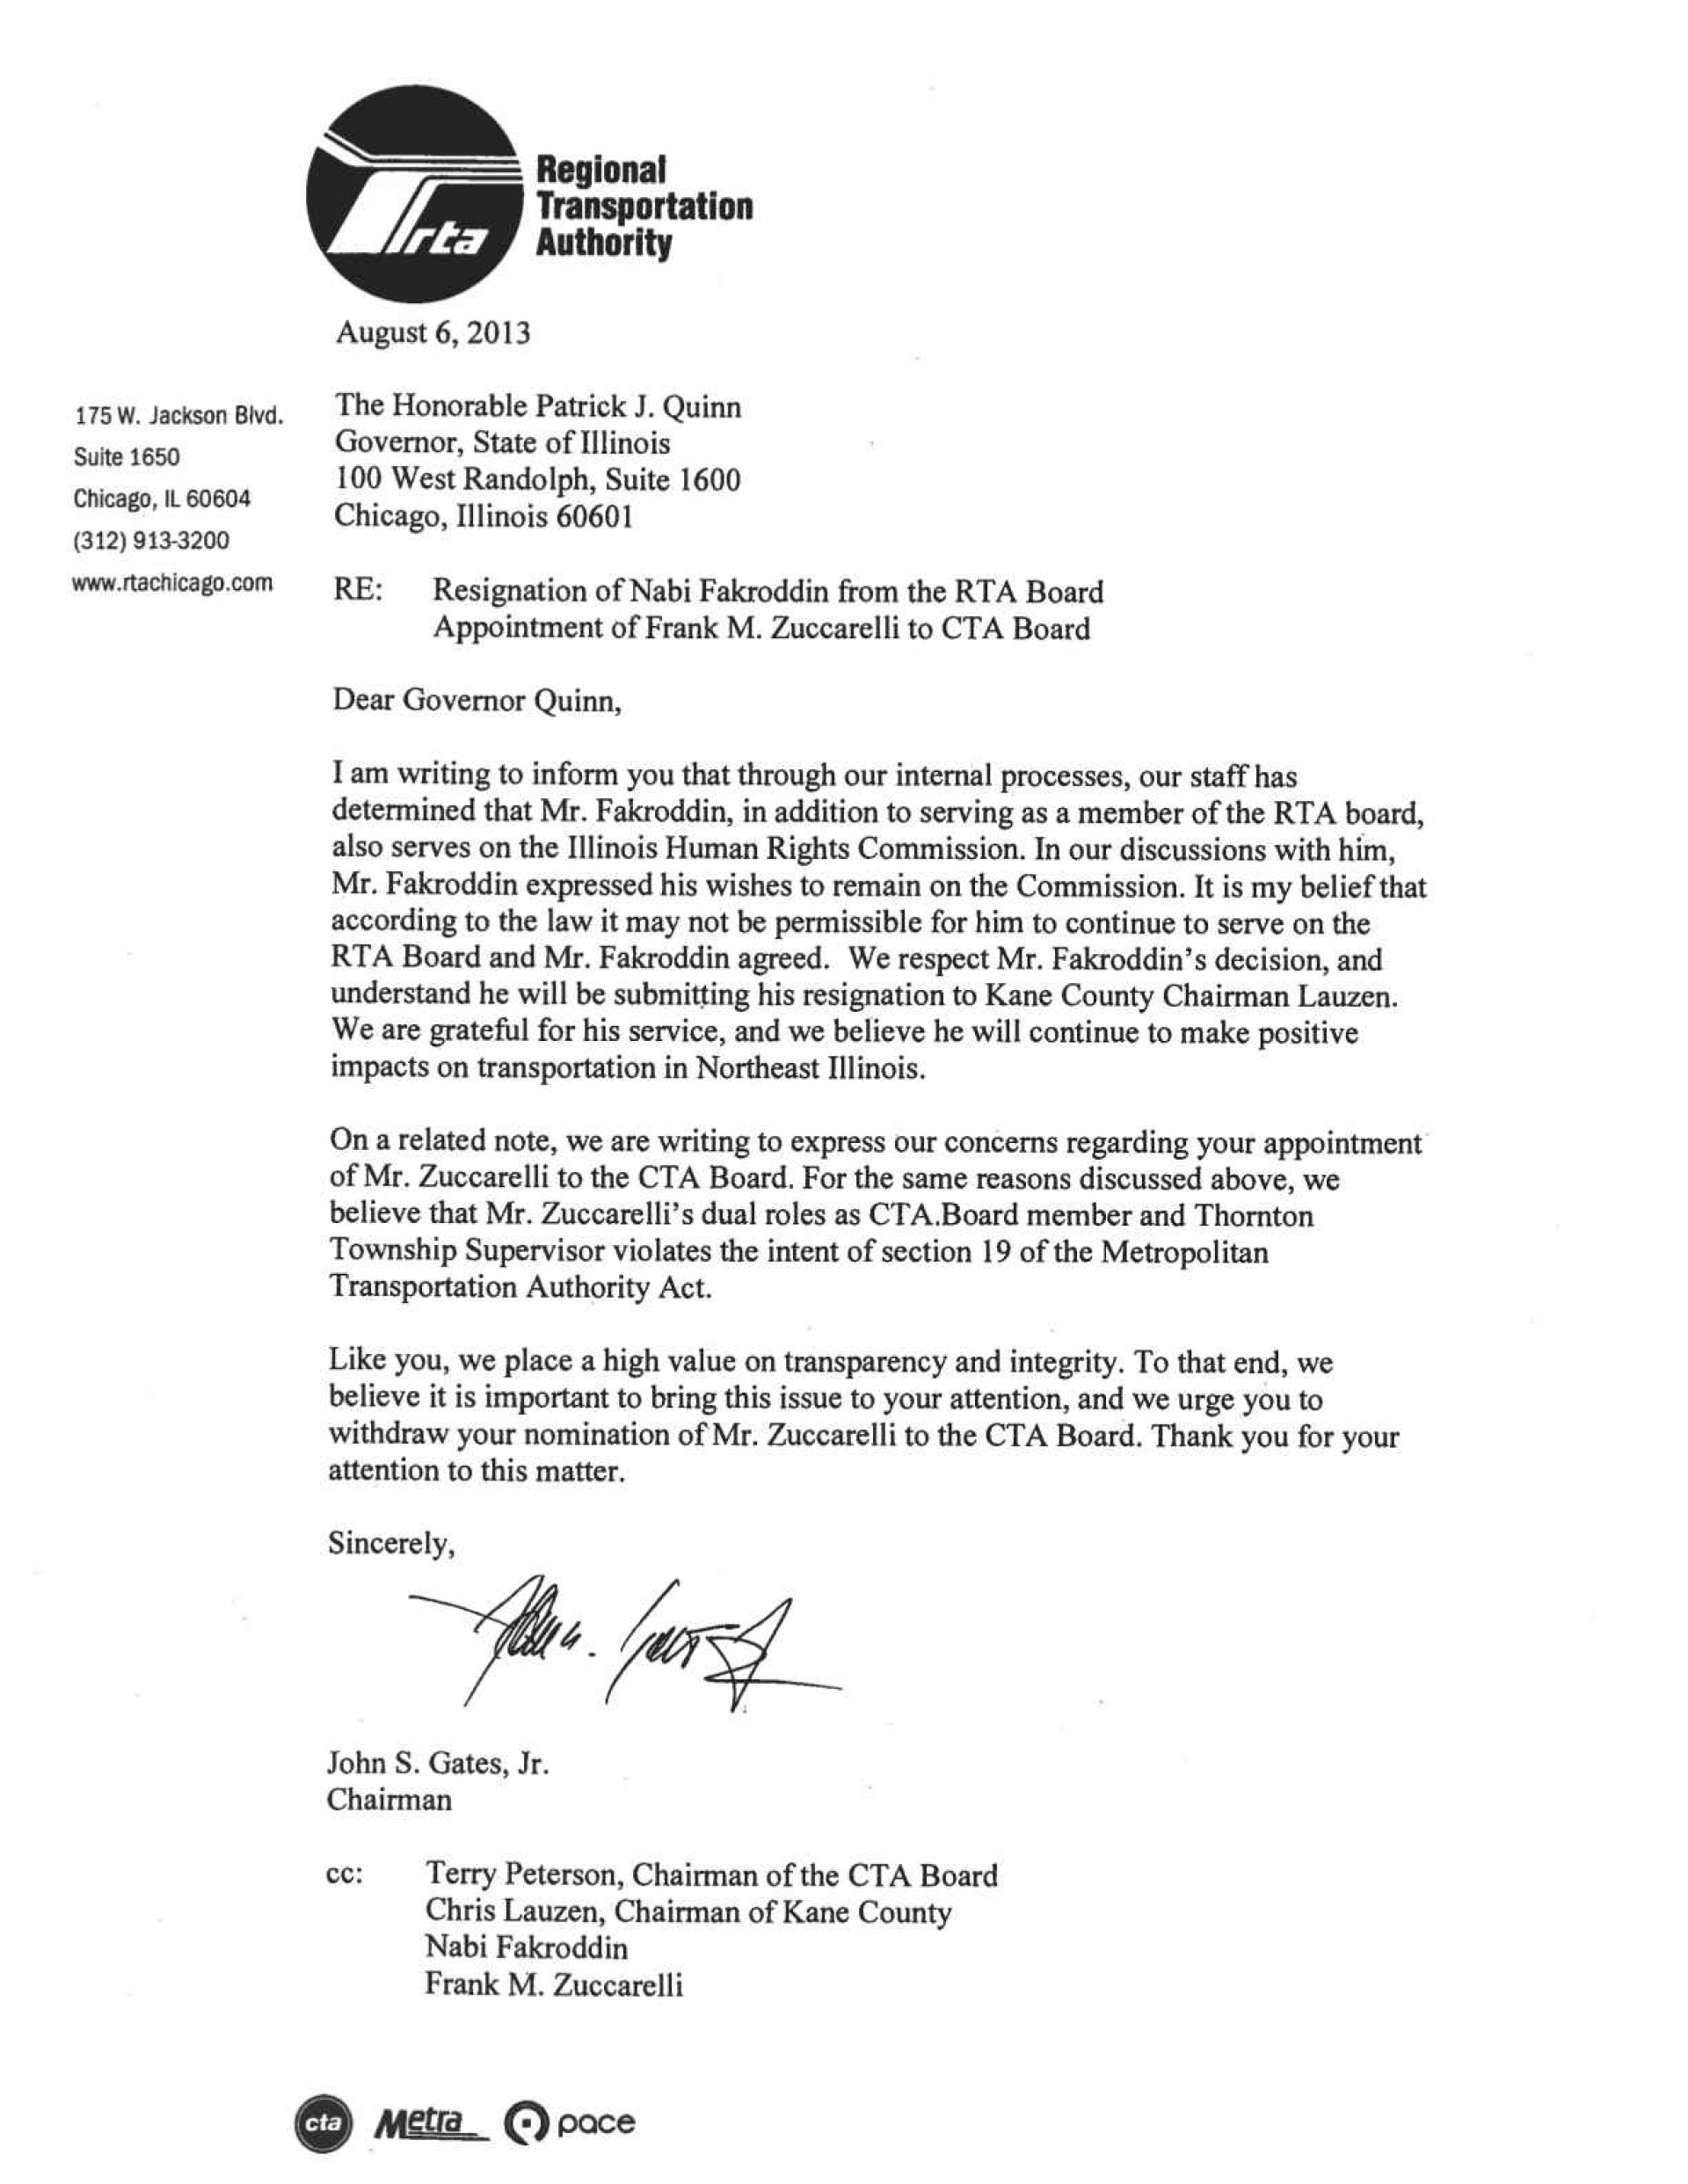 013 Uiuc Essay Example Rta Correspondence Incredible University Of Illinois Samples Examples Help 1920